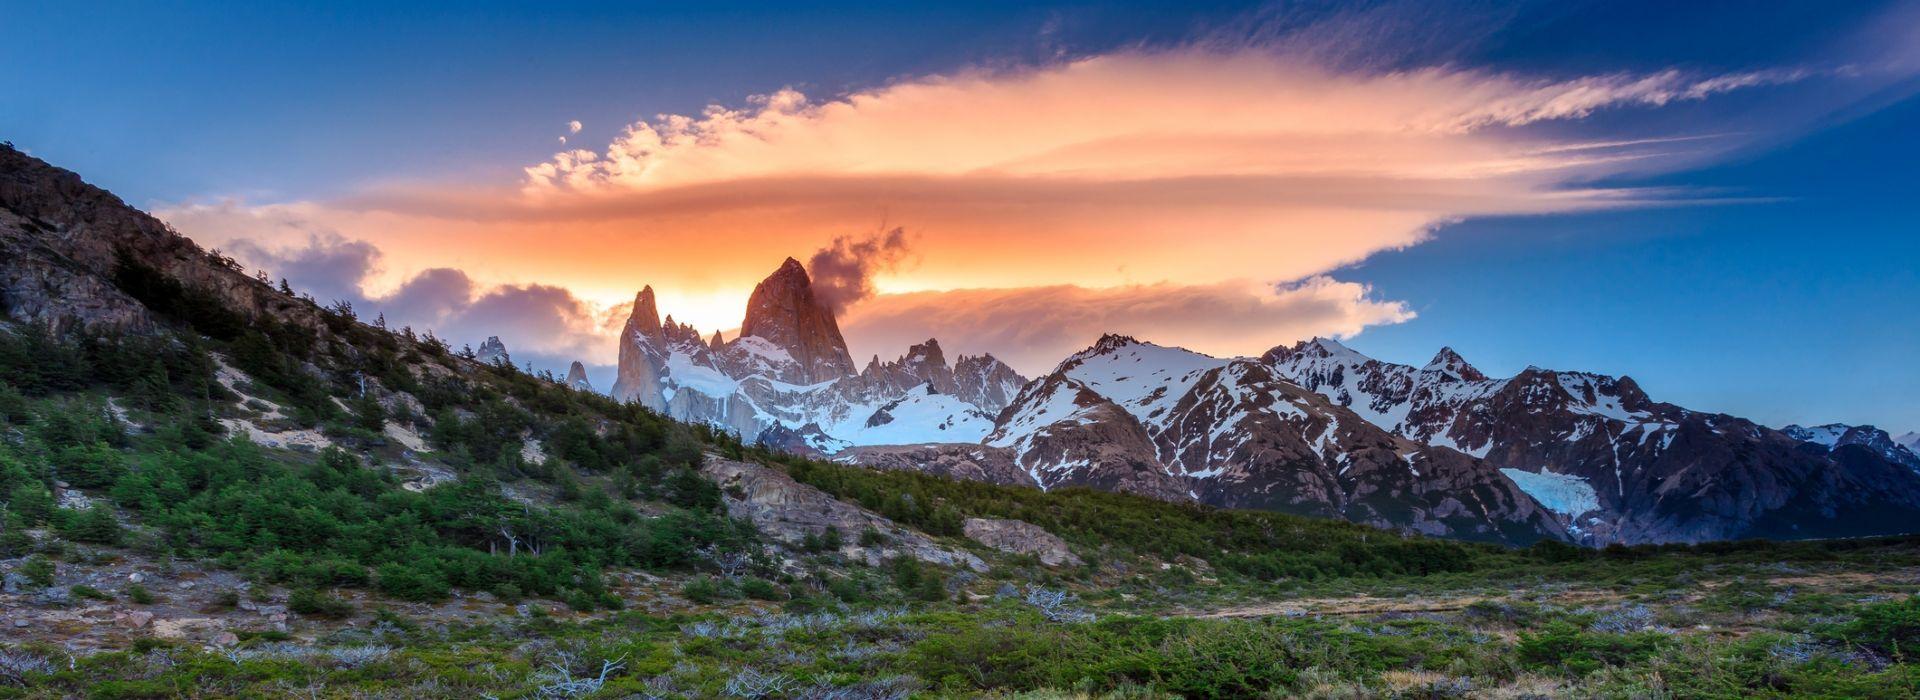 National parks Tours in El Calafate